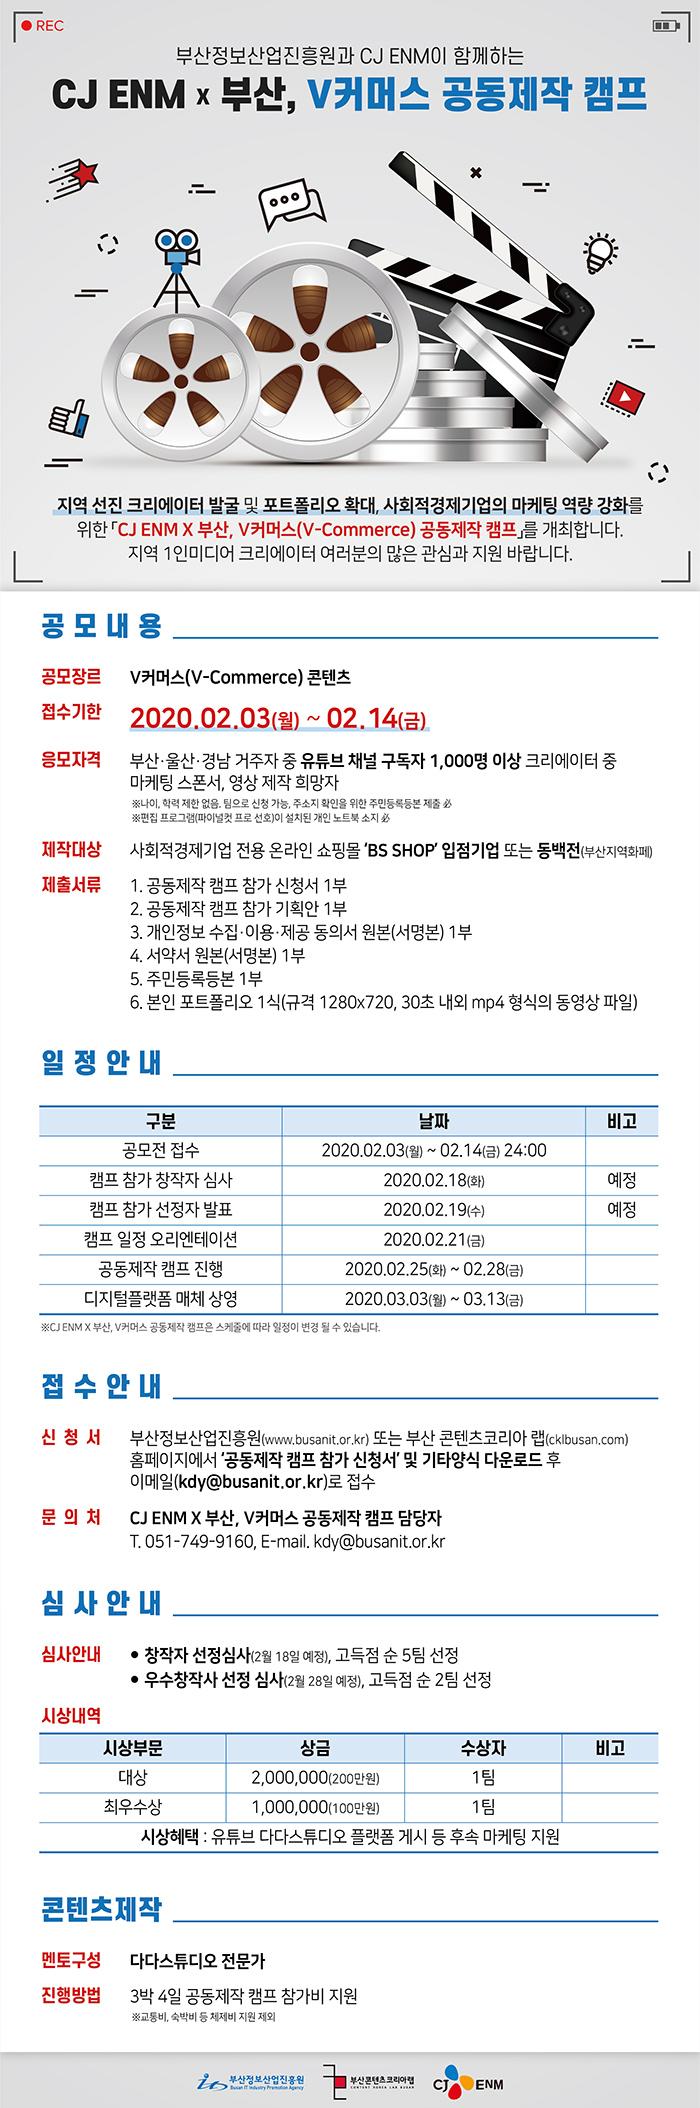 CJ ENM X 부산, V커머스 공동제작 캠프 참가 공고문